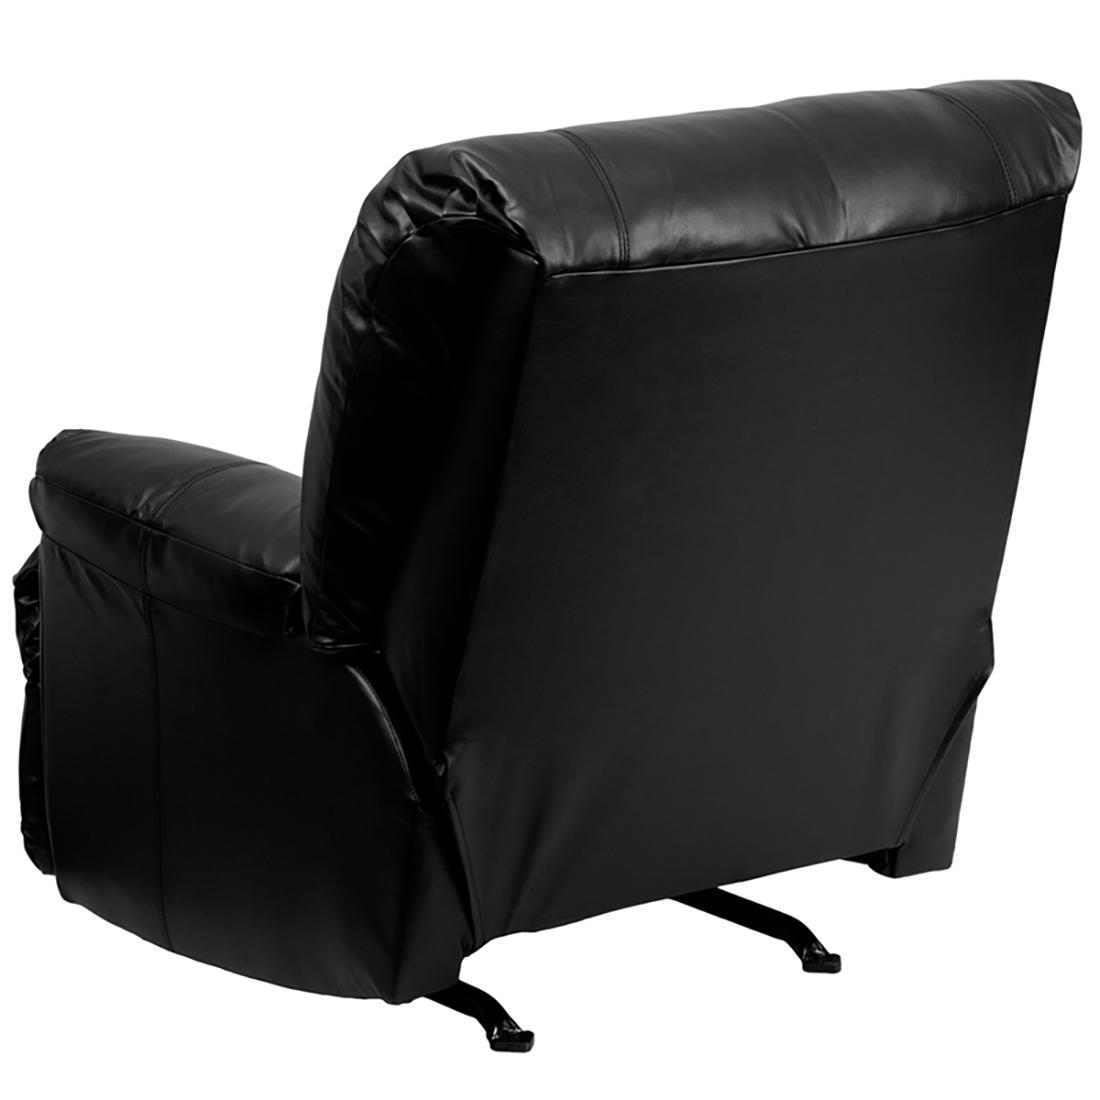 black leather heavily padded rocker recliner